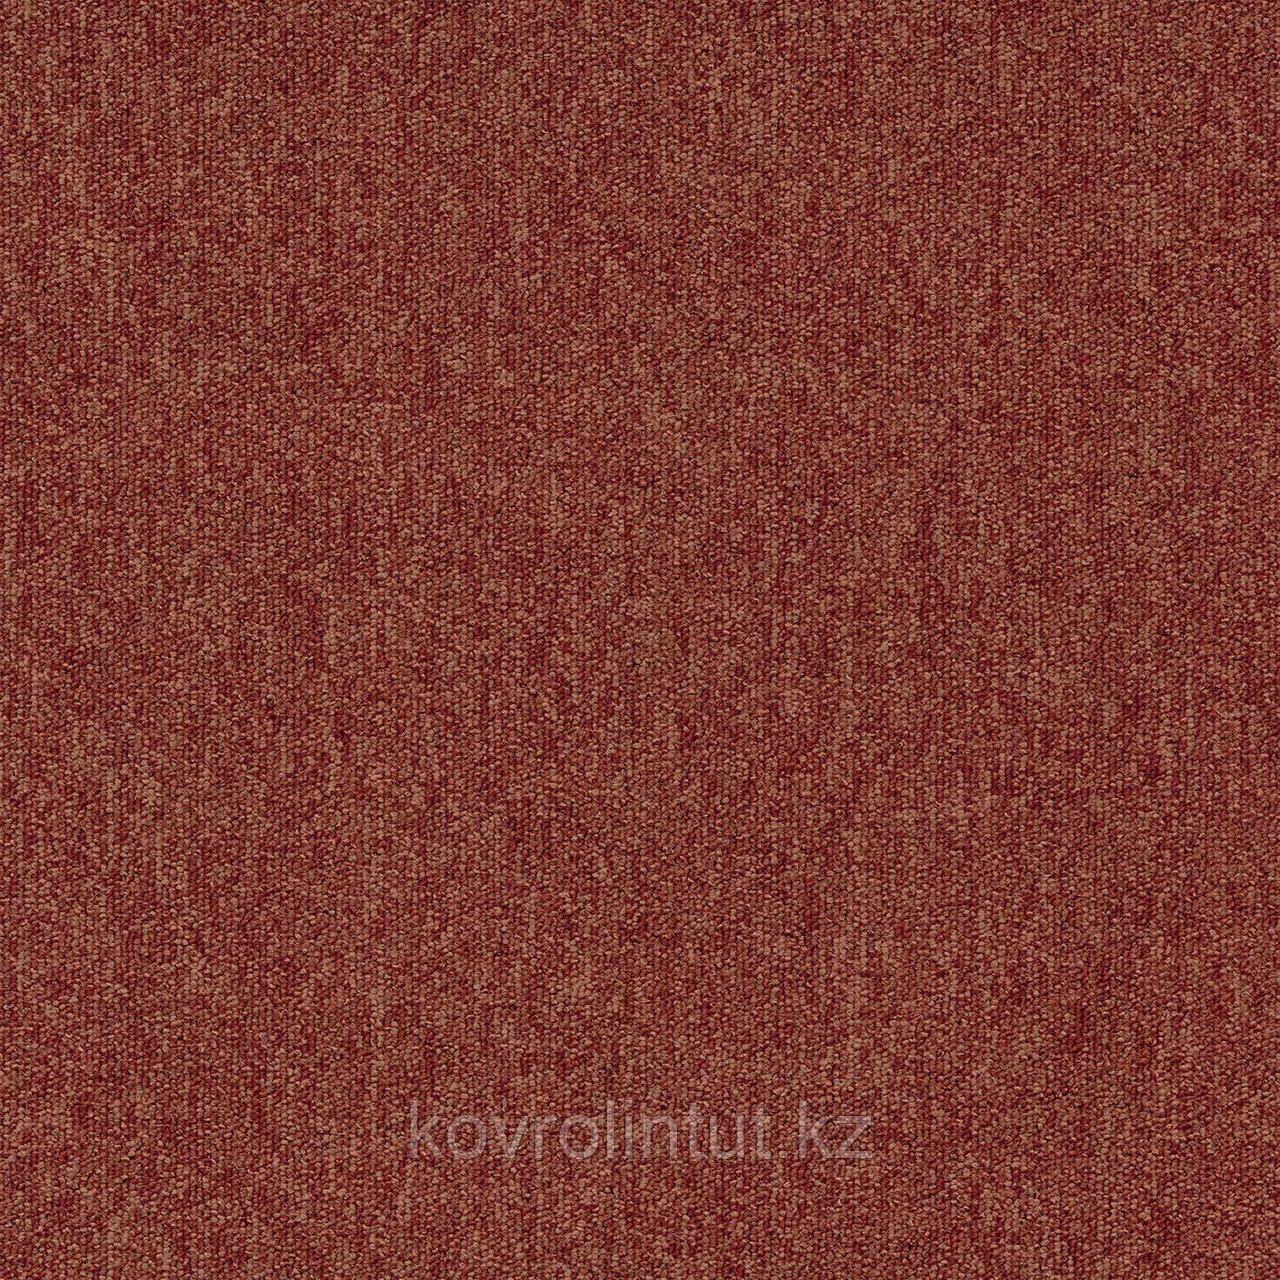 Плитка ковровая Modulyss First 313, 100% PA